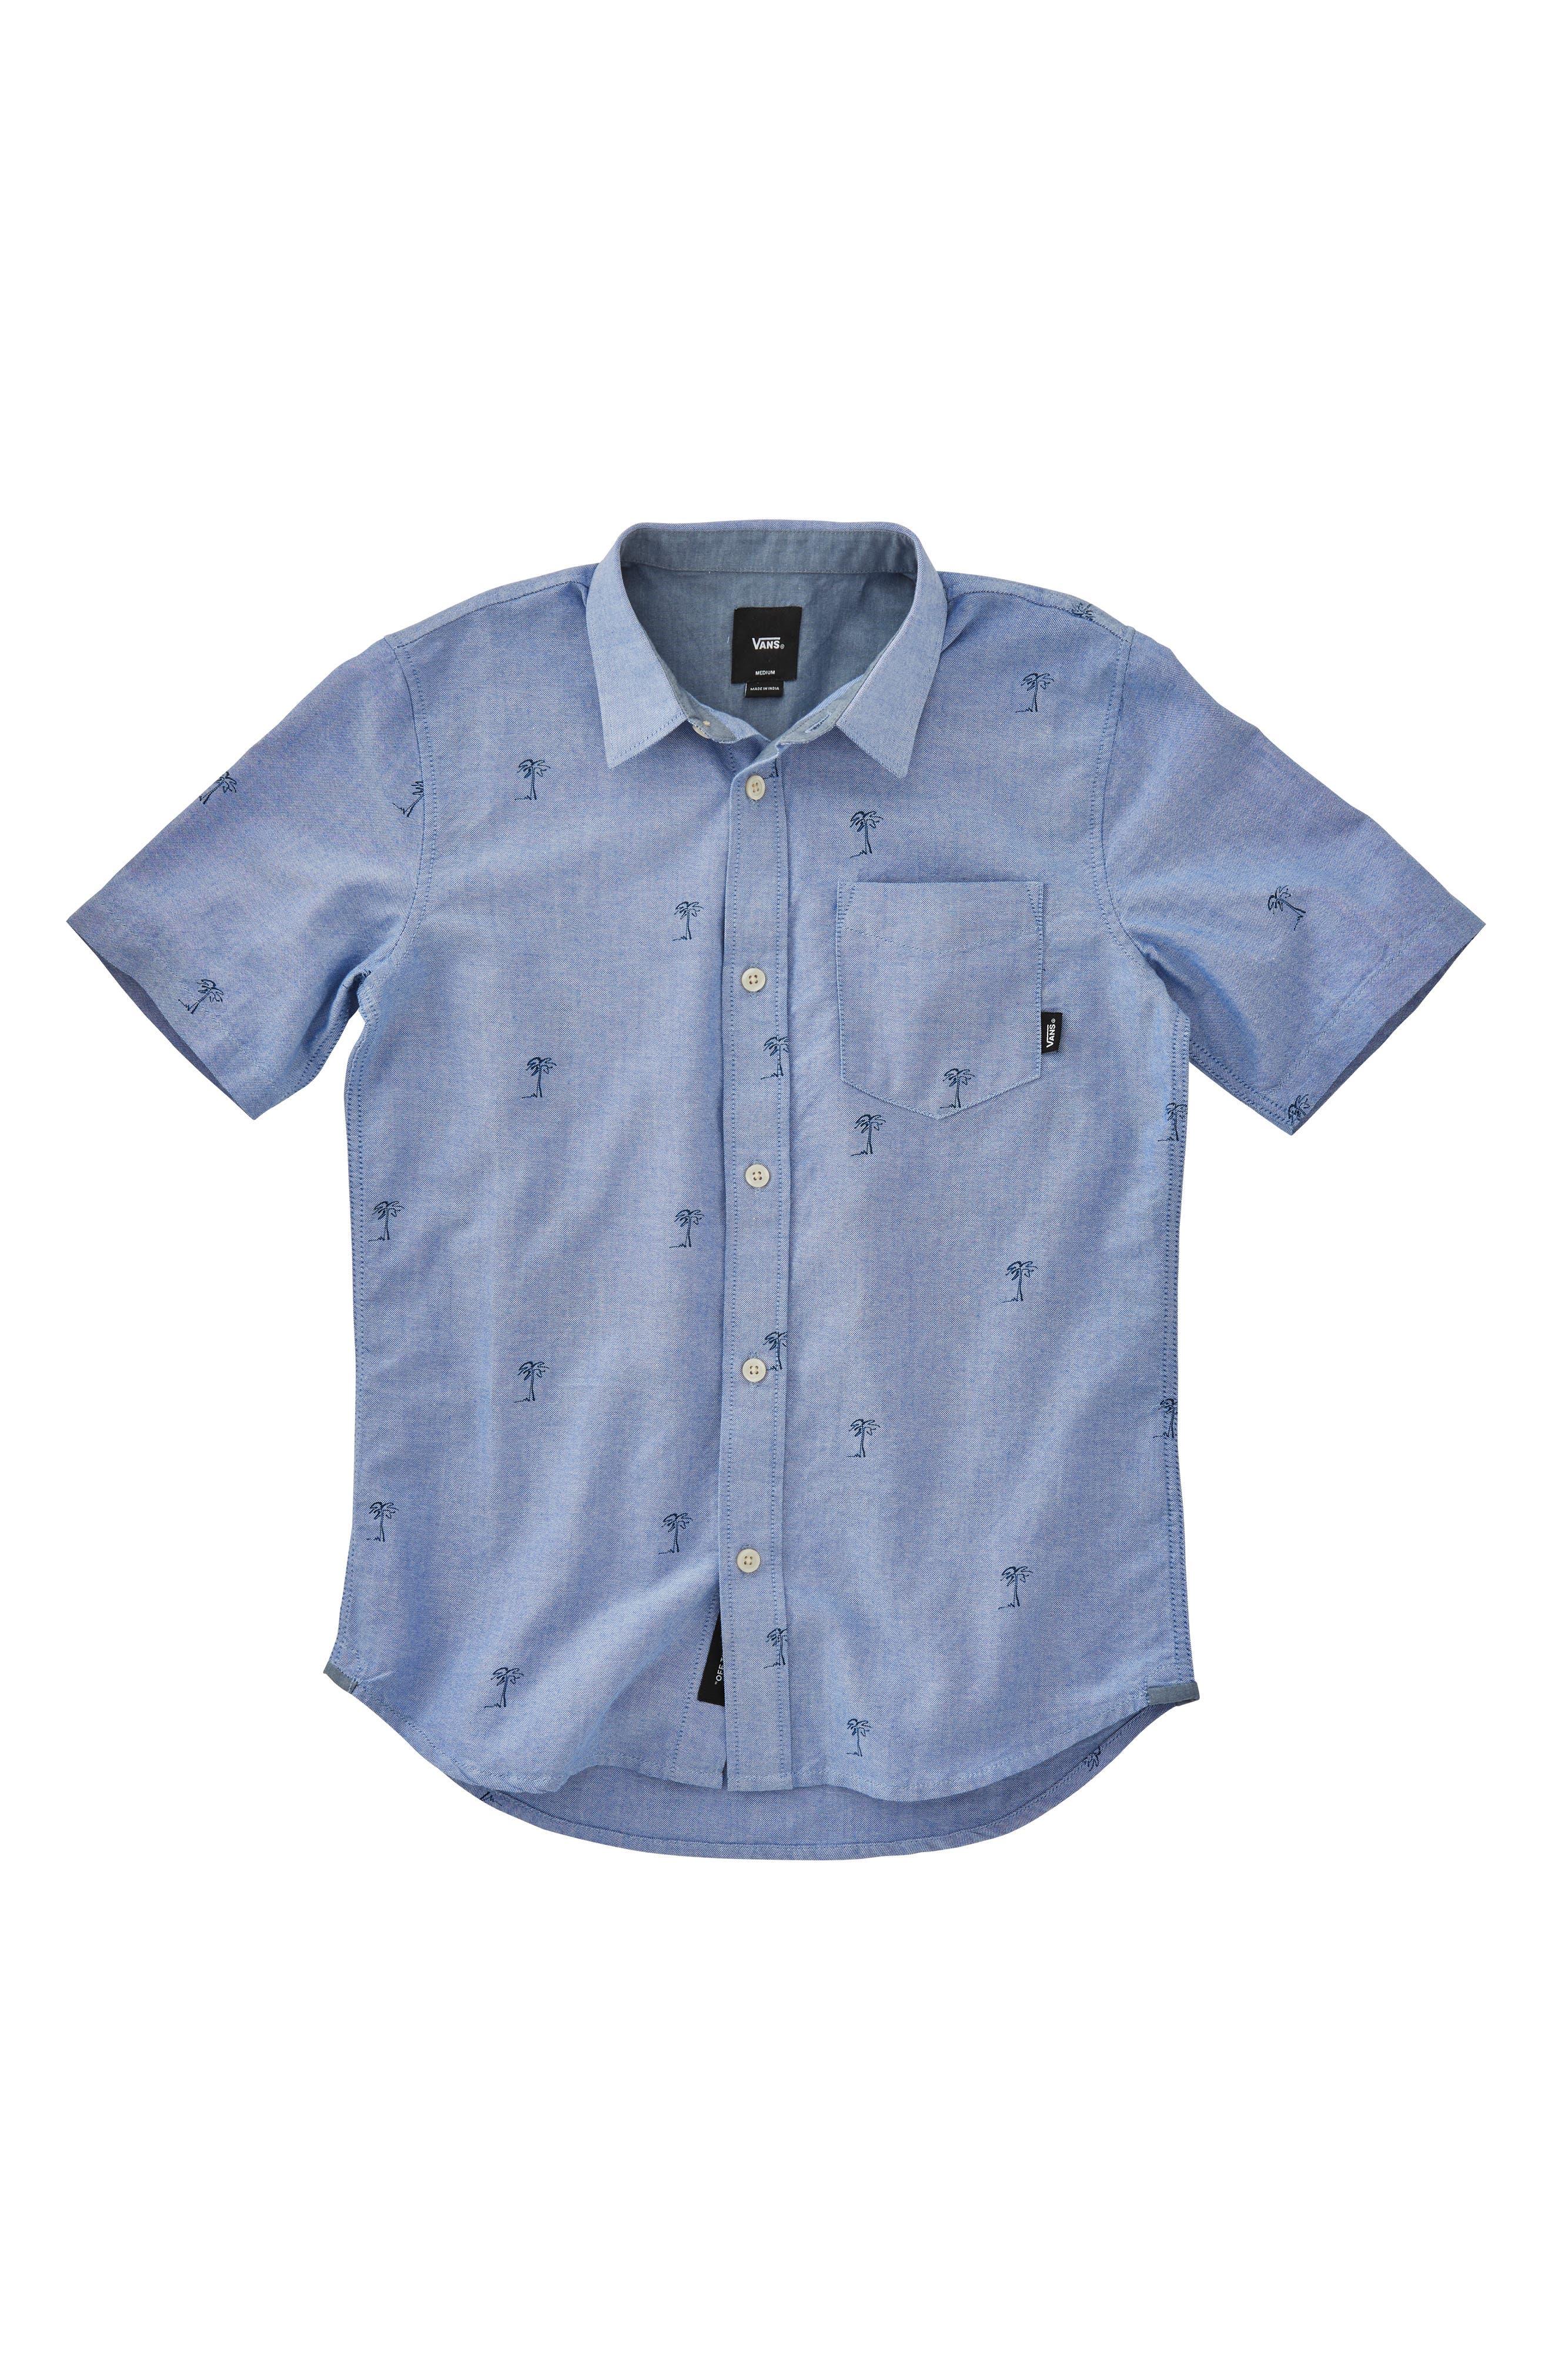 Houser Woven Shirt,                         Main,                         color, MAZARINE BLUE